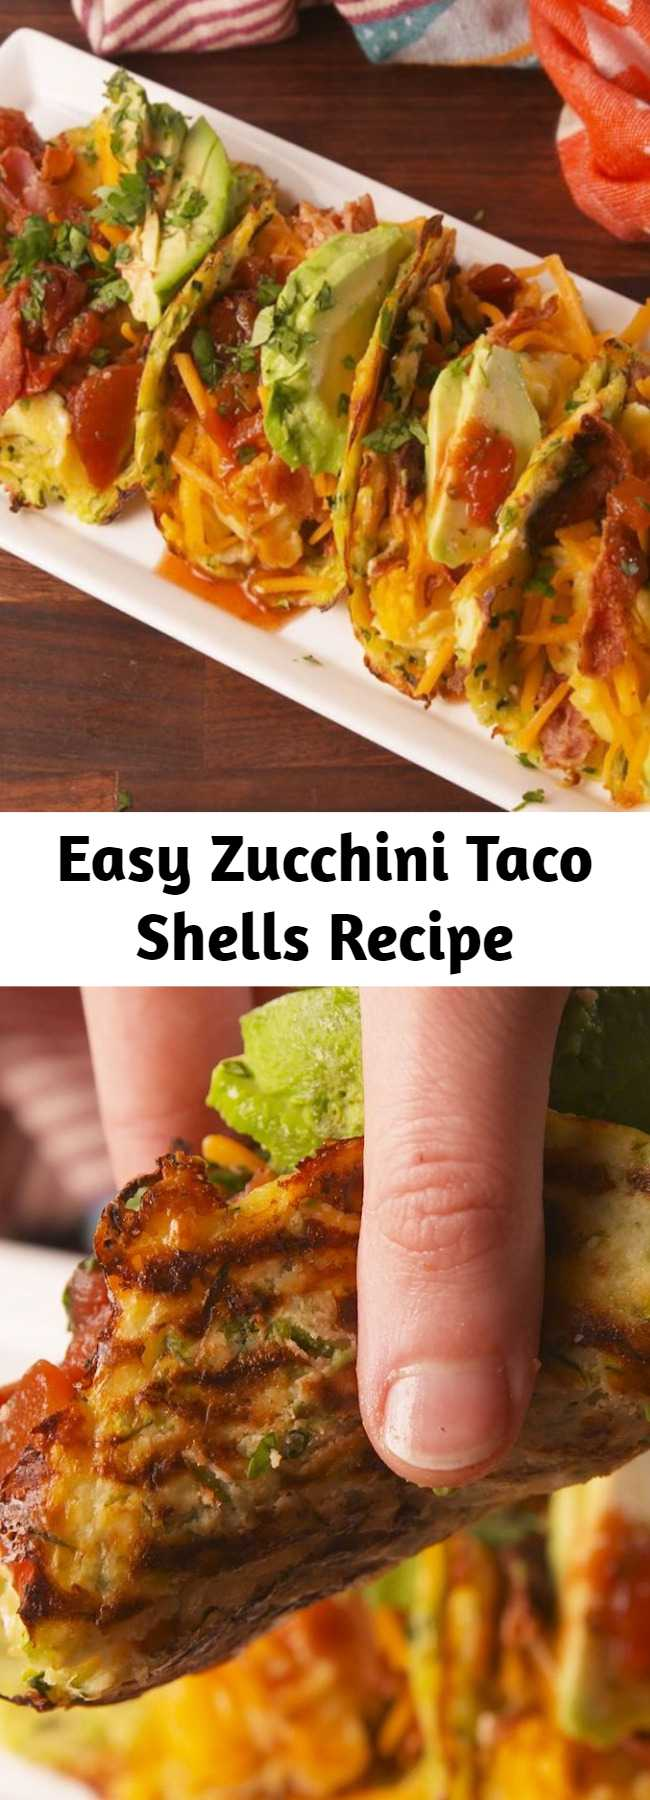 Easy Zucchini Taco Shells Recipe - Turn zucchini into taco shells for your next taco night. #easy #recipe #healthy #zucchini #taco #tacoshells #diet #lowcarb #lowcarbdiet